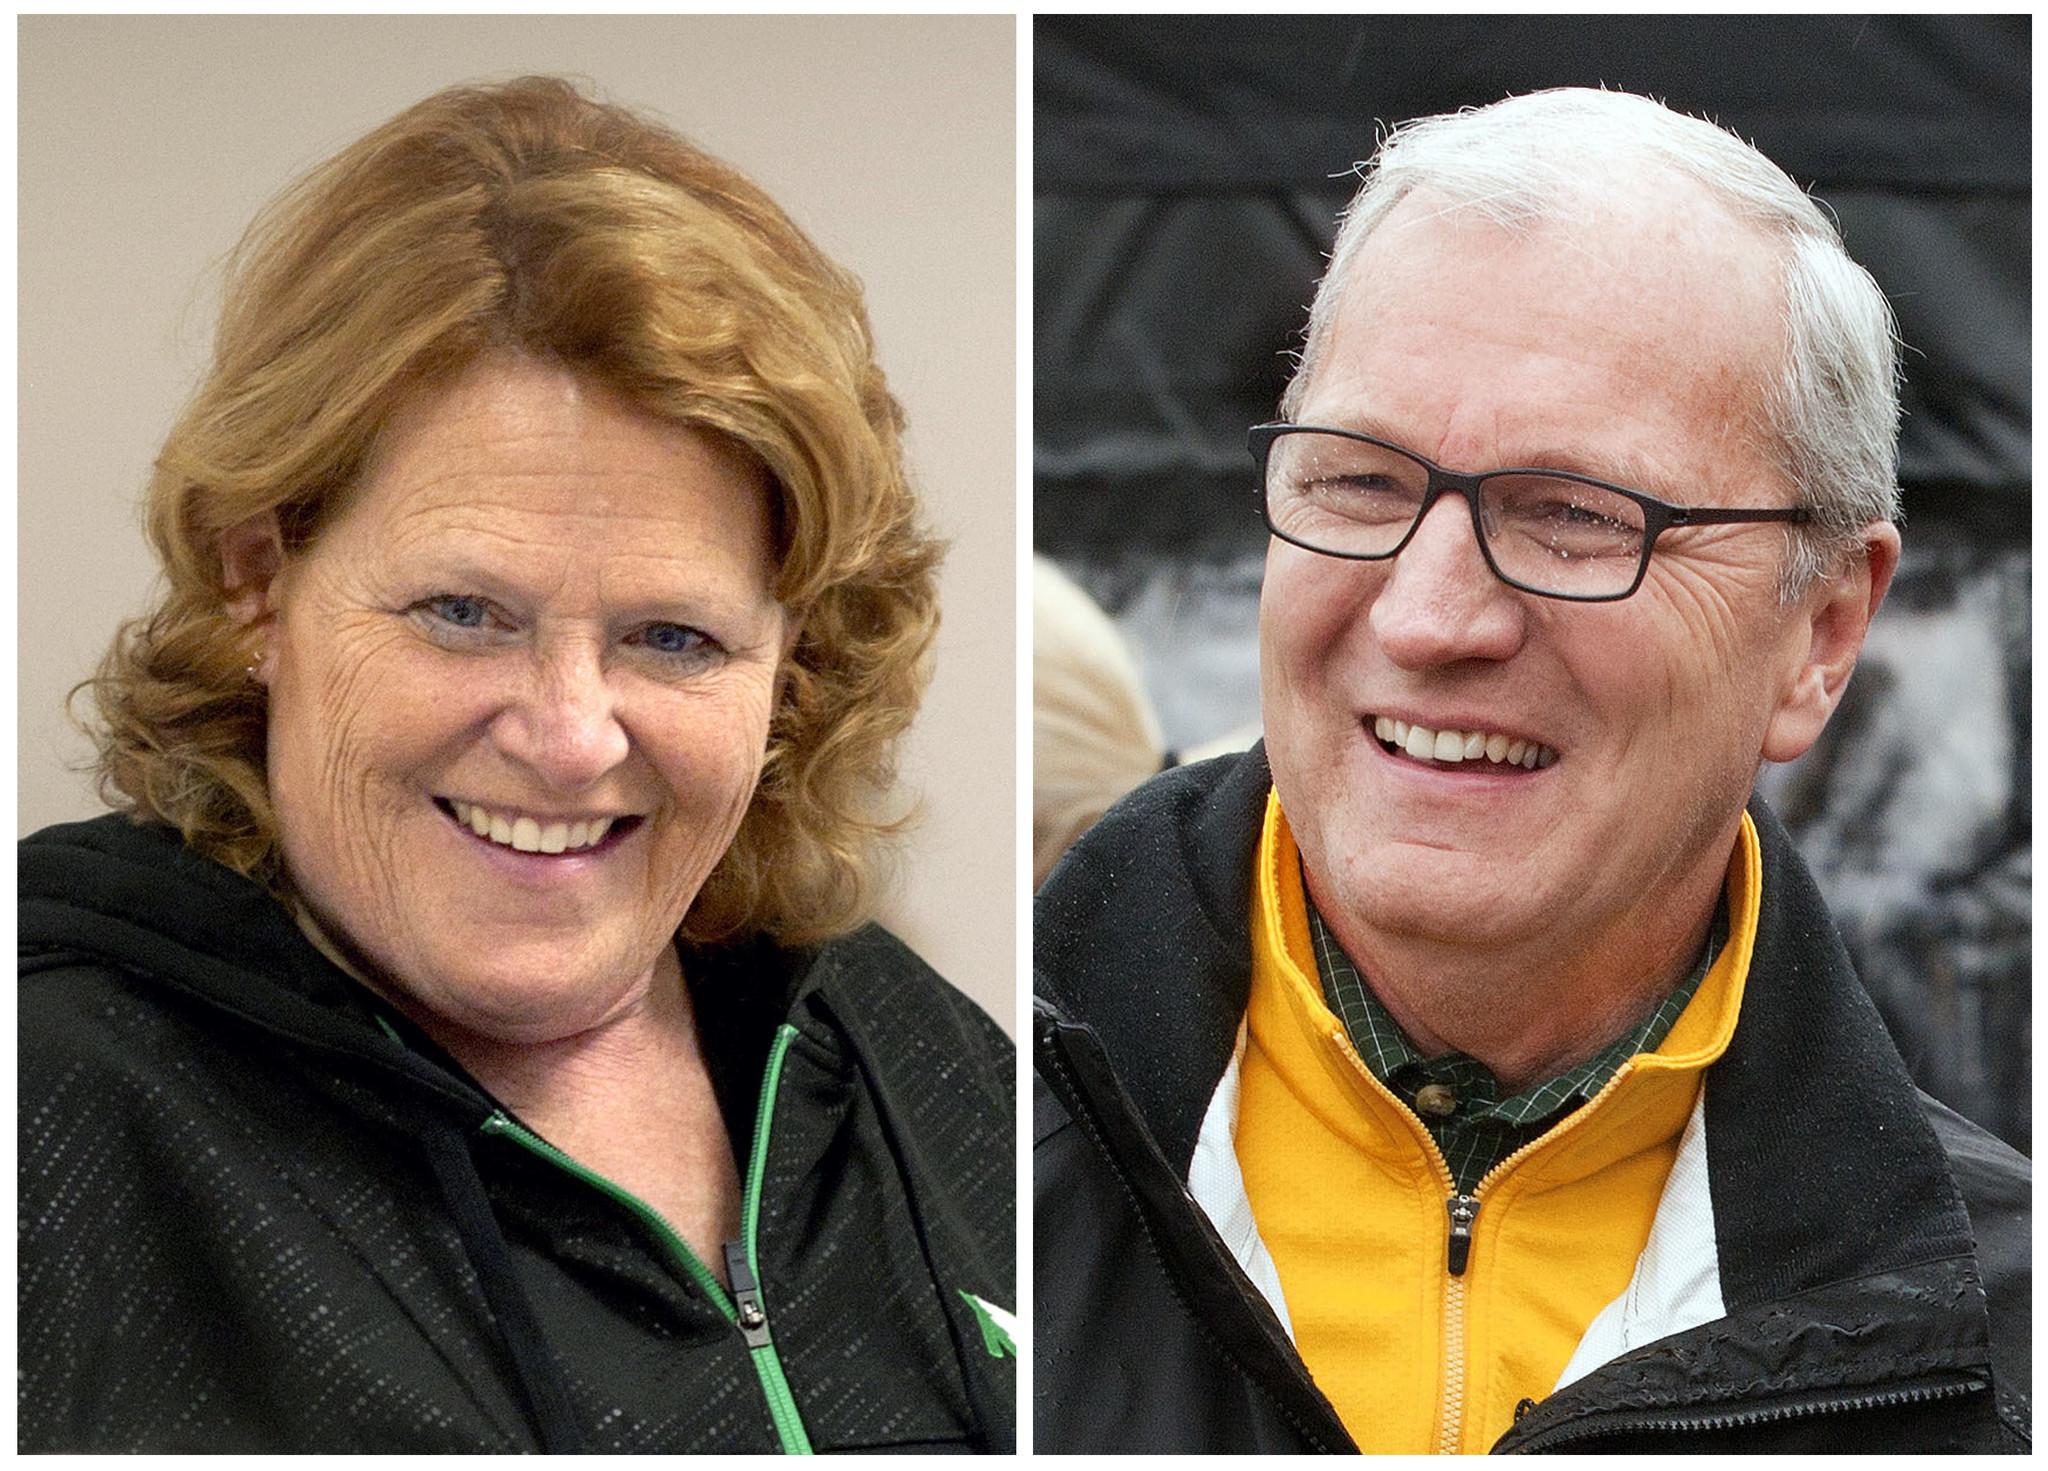 Republican Rep. Kevin Cramer wins North Dakota Senate race, ousts Democratic incumbent Heidi Heitkamp